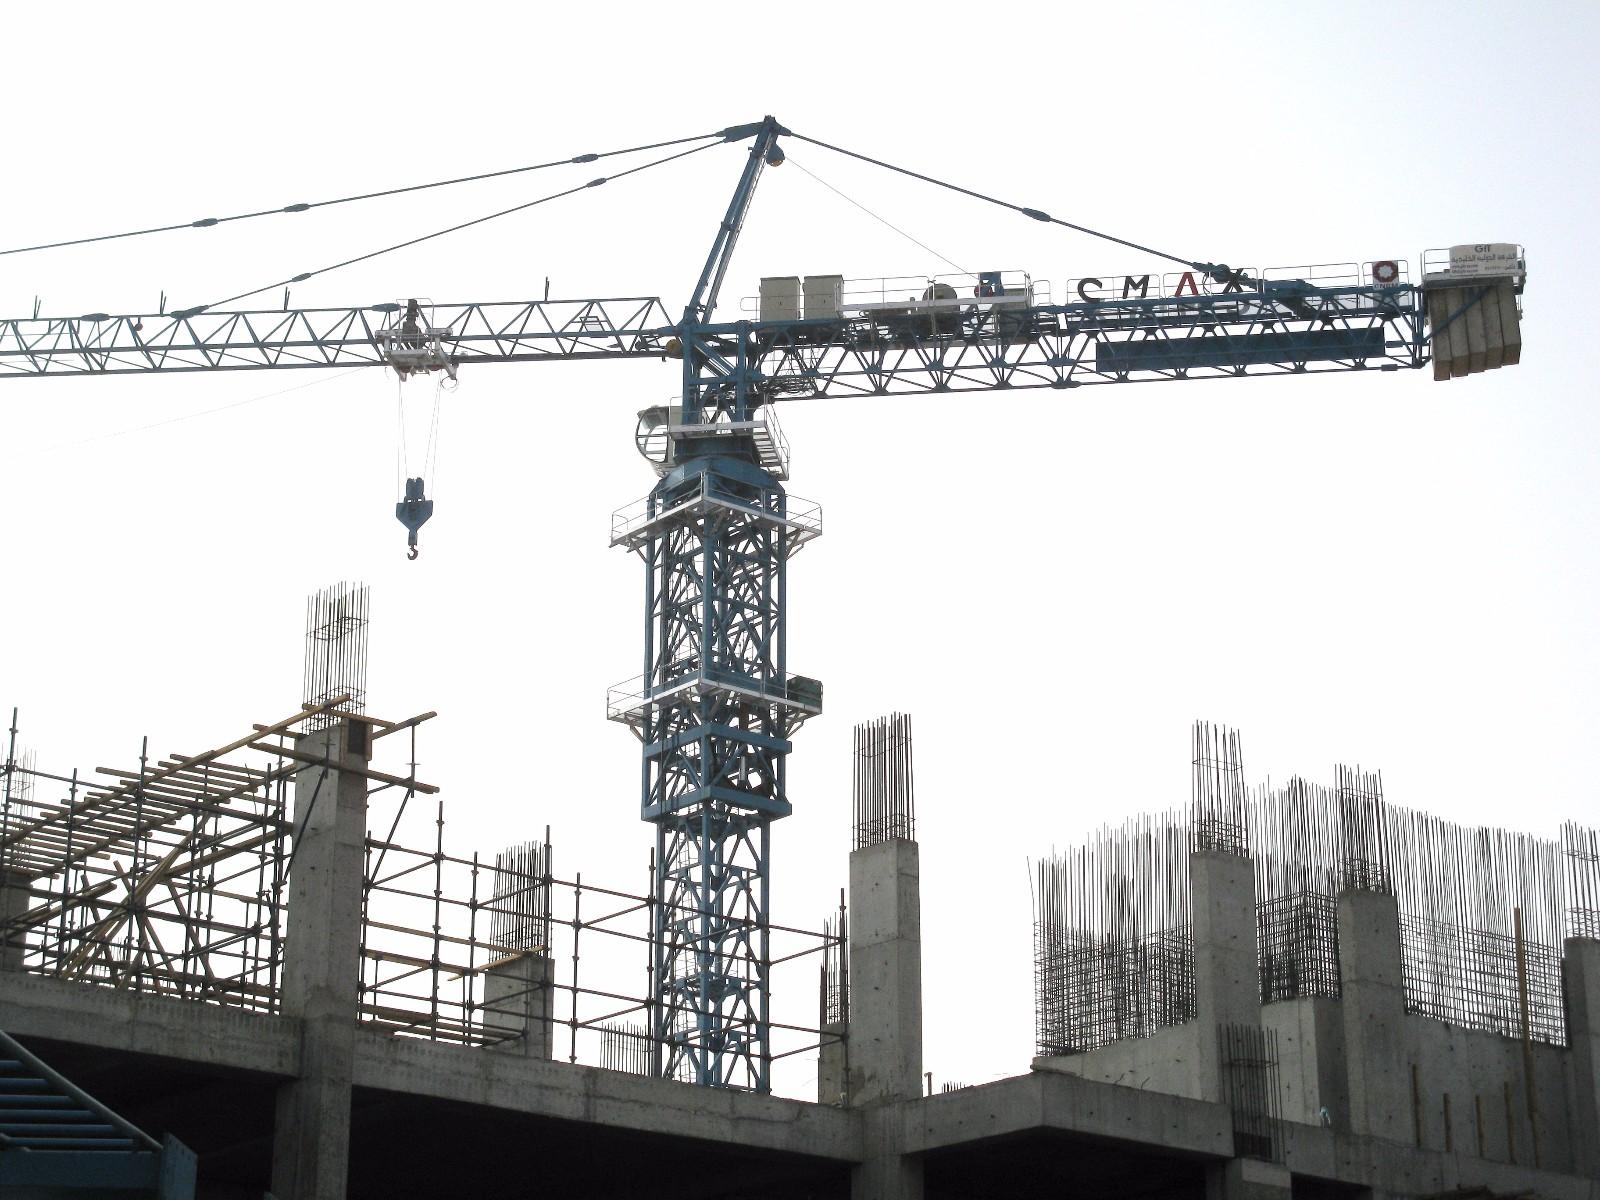 tower crane self erecting tower crane luffing tower crane flat top tower crane tower cranes potain